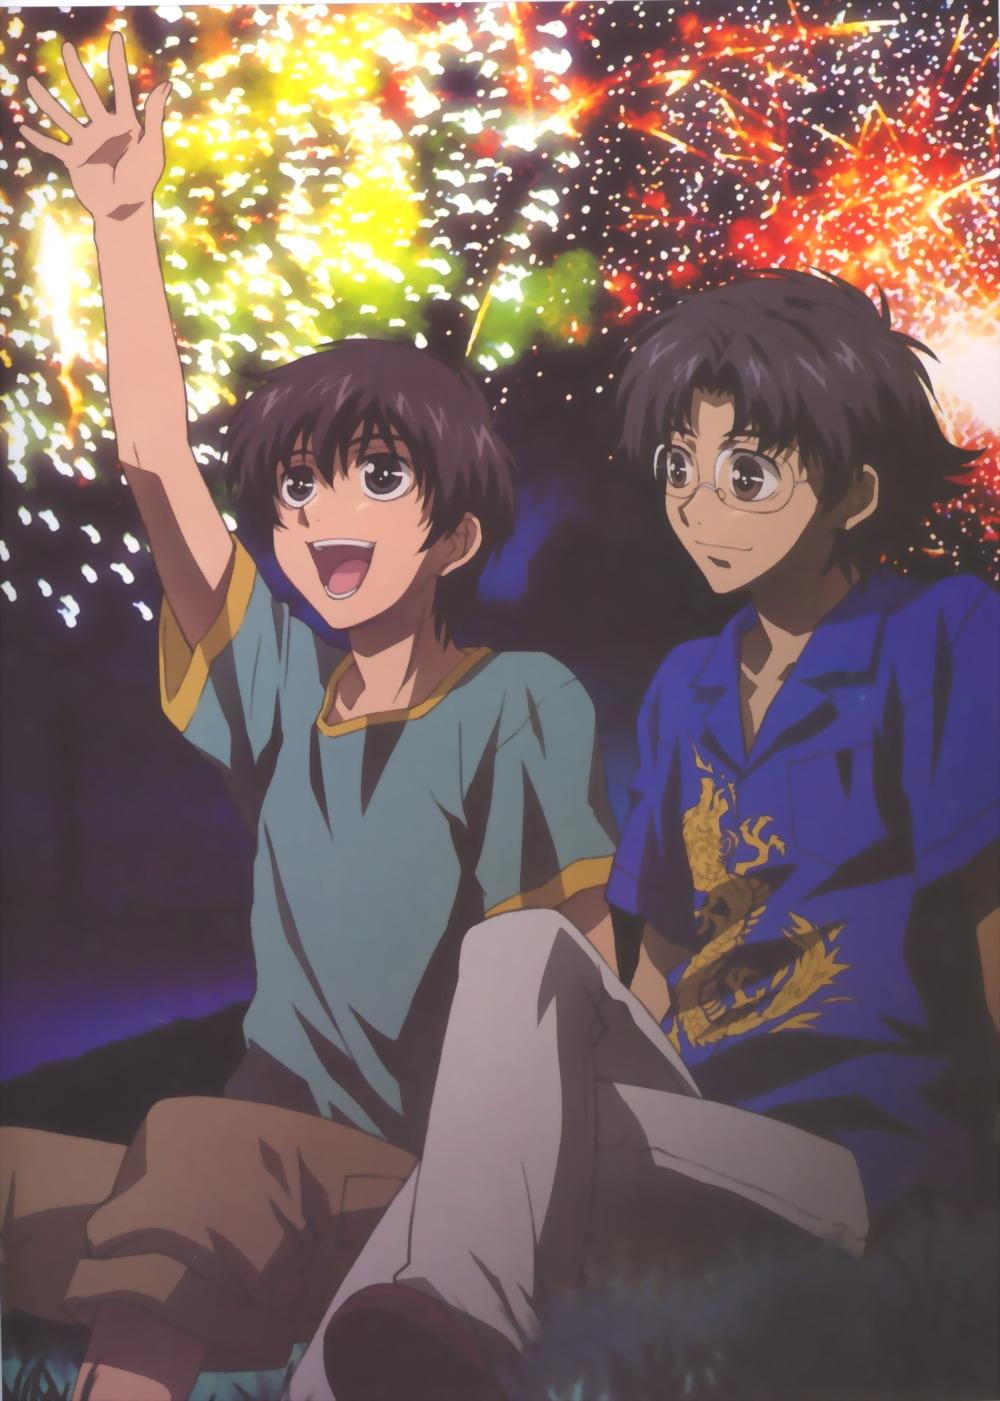 kyou kara maou anime download